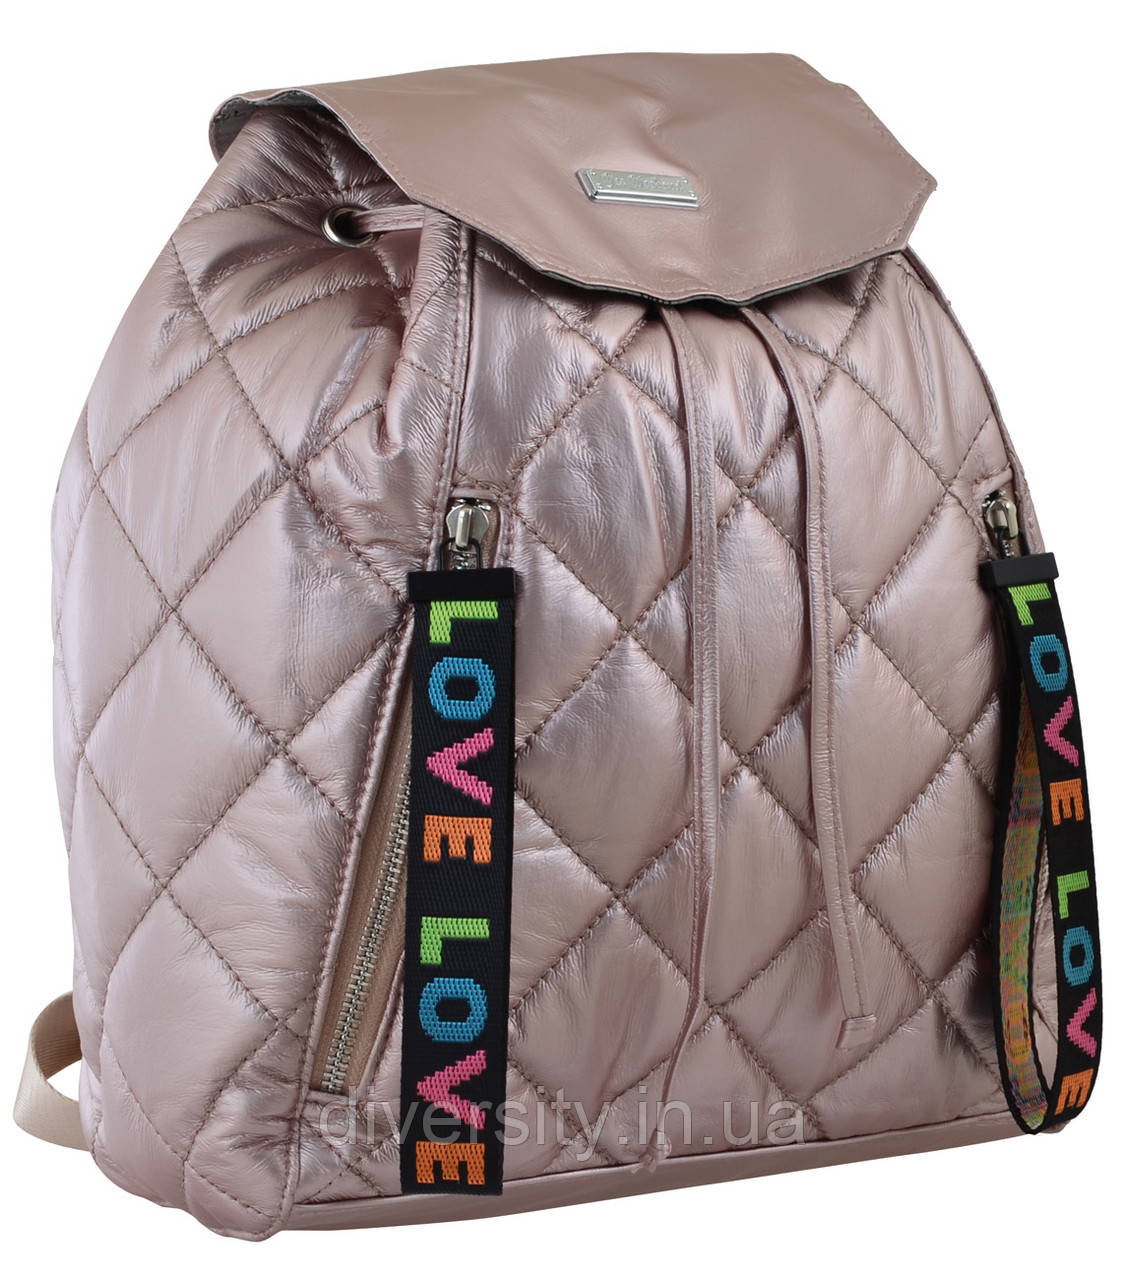 "Женский рюкзак YES YW-28 ""Glamor Tucana"""